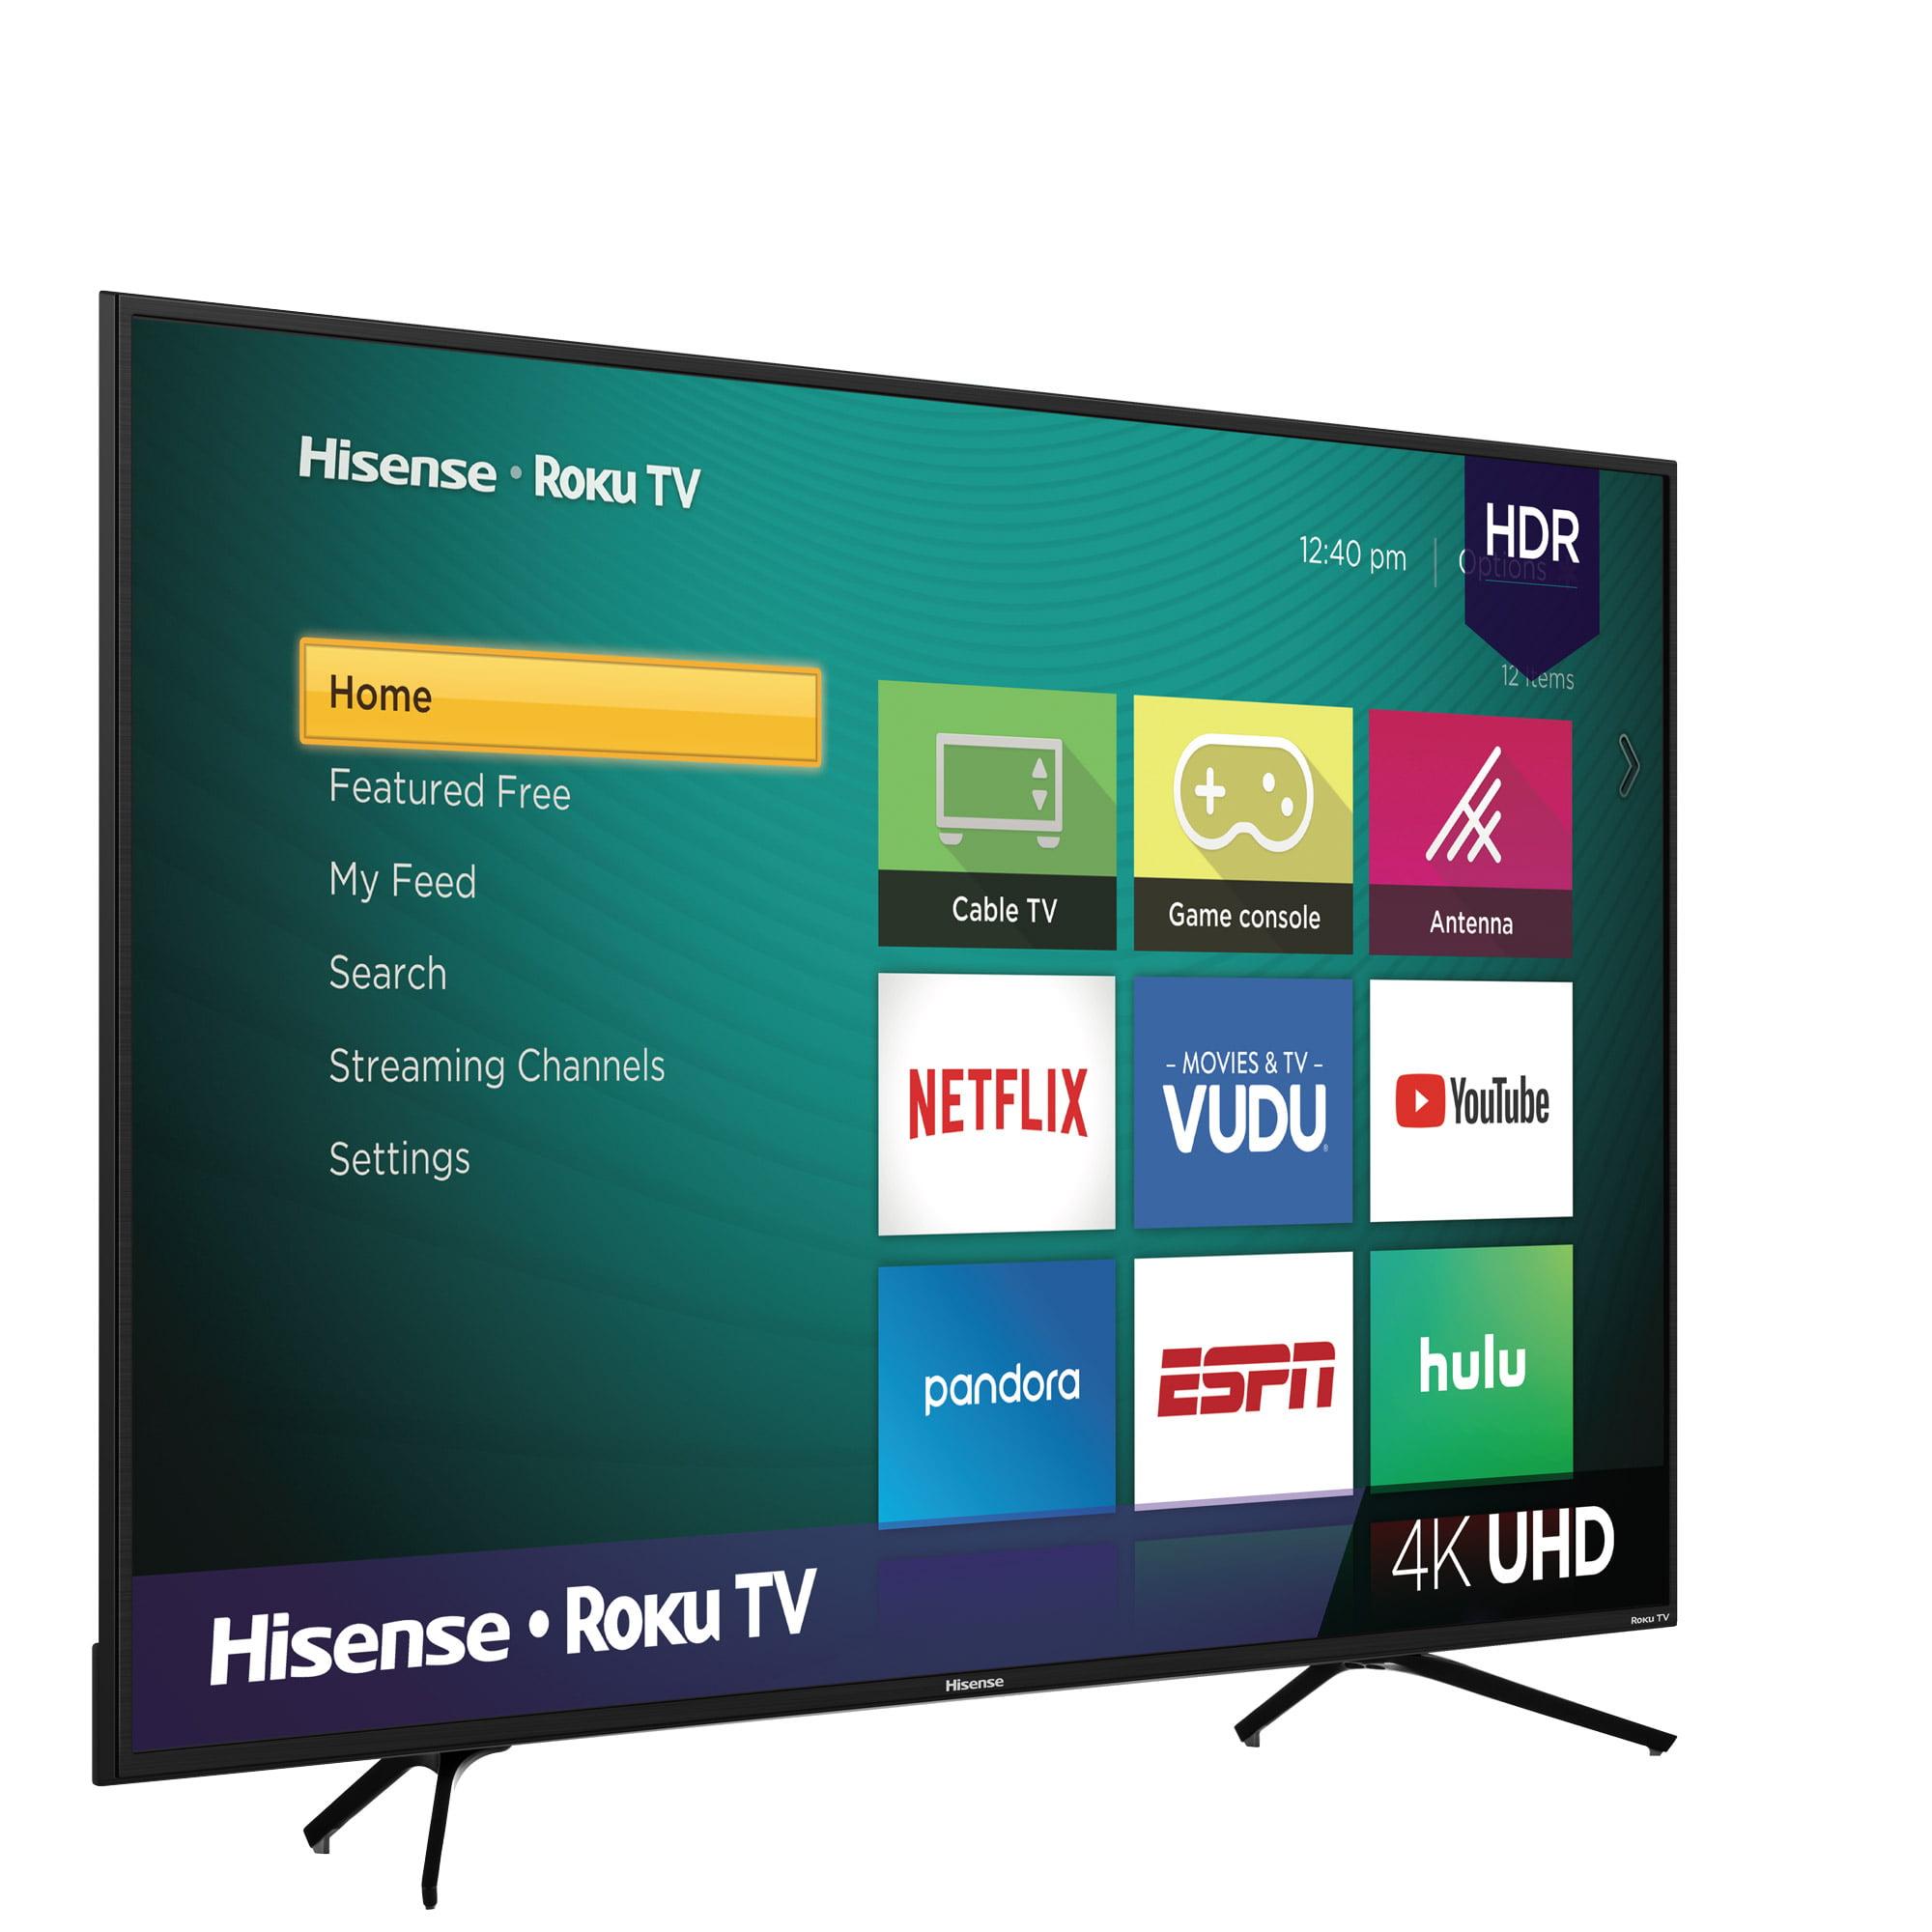 Hisense 65 Class 4k Uhd Led Roku Smart Tv Hdr 65r6e1 Walmart Com Walmart Com